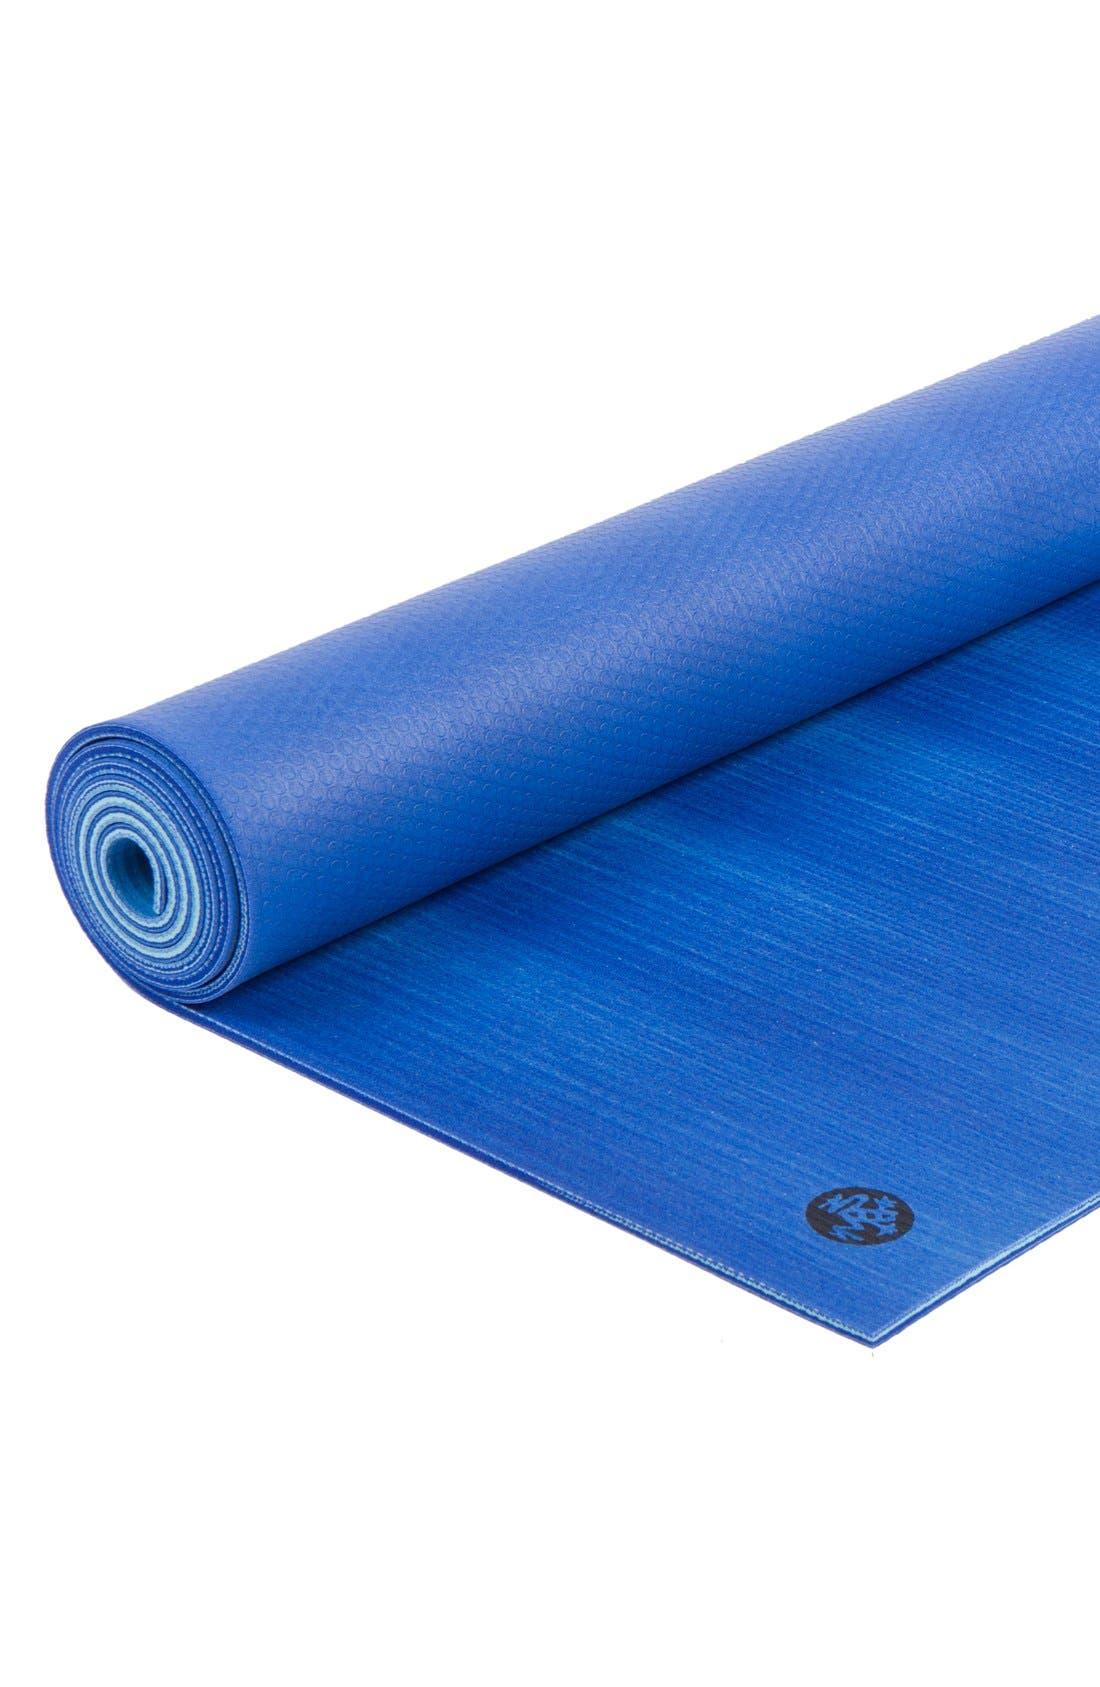 Alternate Image 1 Selected - Manduka 'PRO®' Yoga Mat